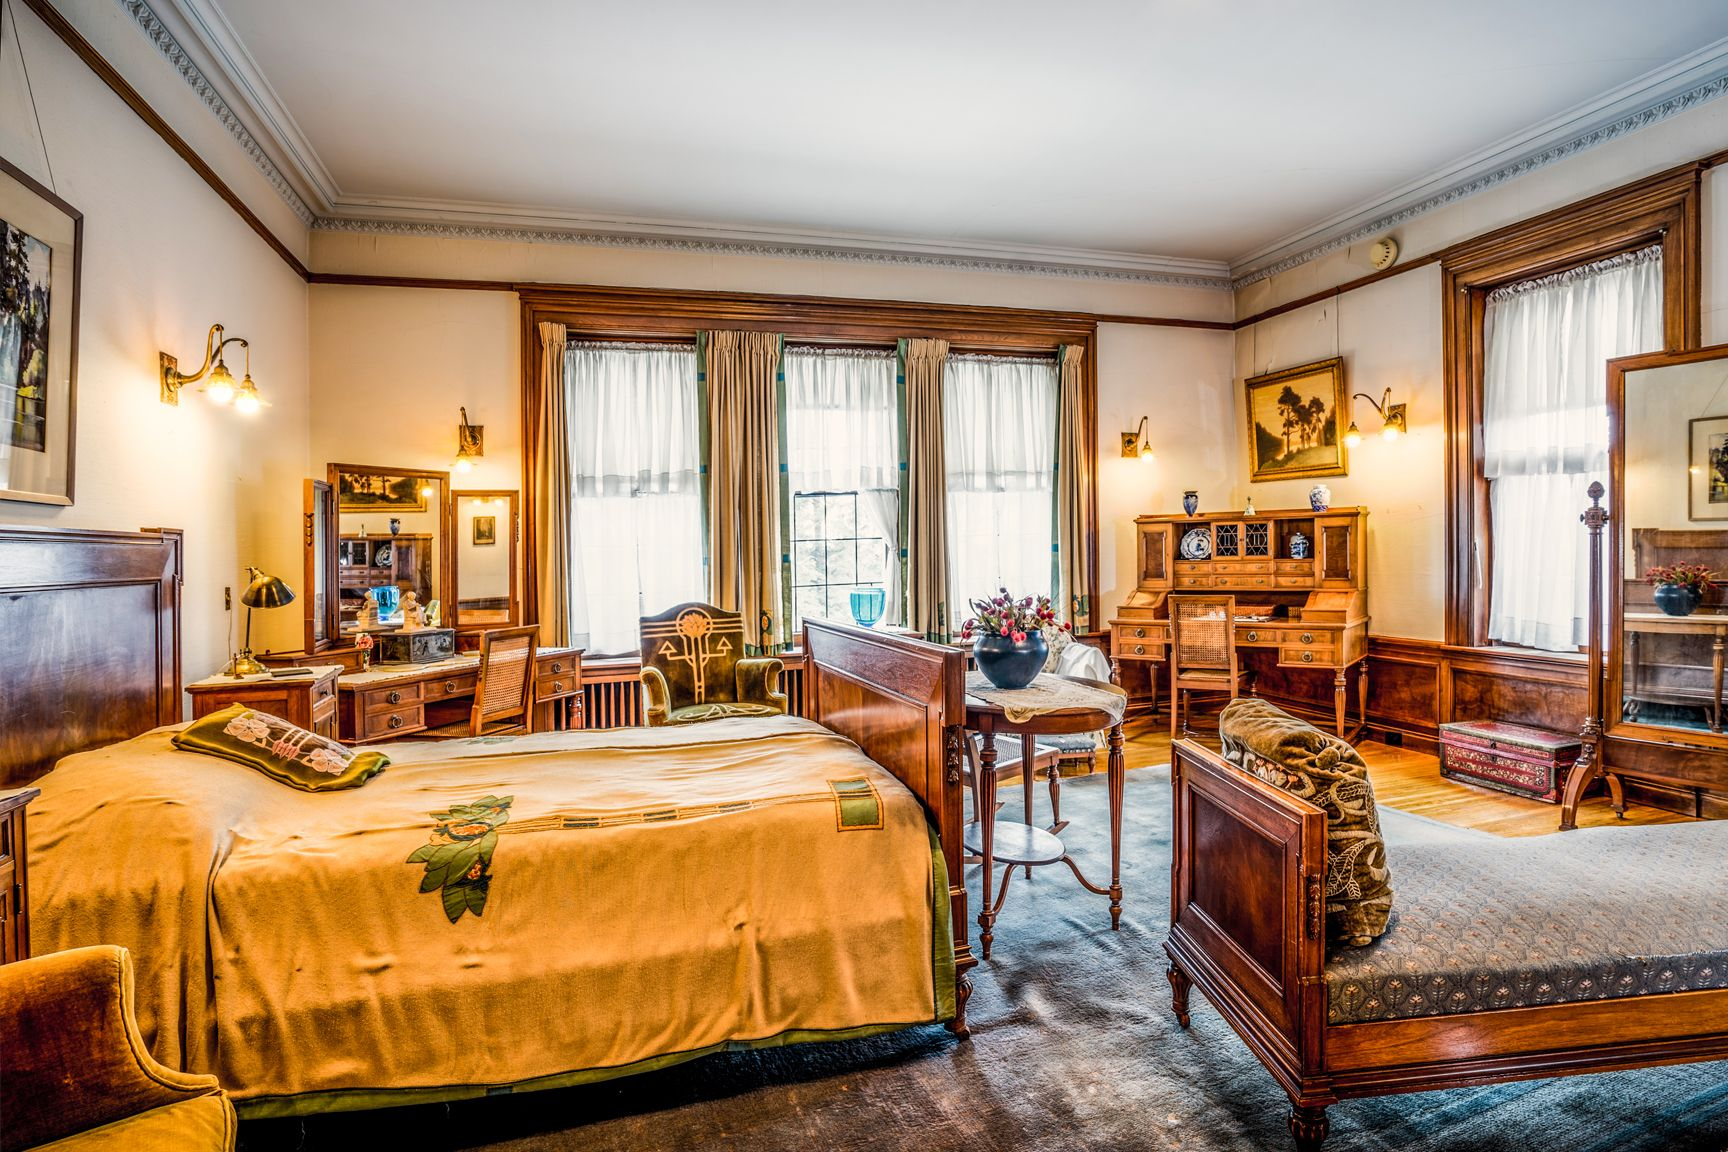 Mansion Master Bedrooms chester and clara congdon's master bedroom at glensheen mansion